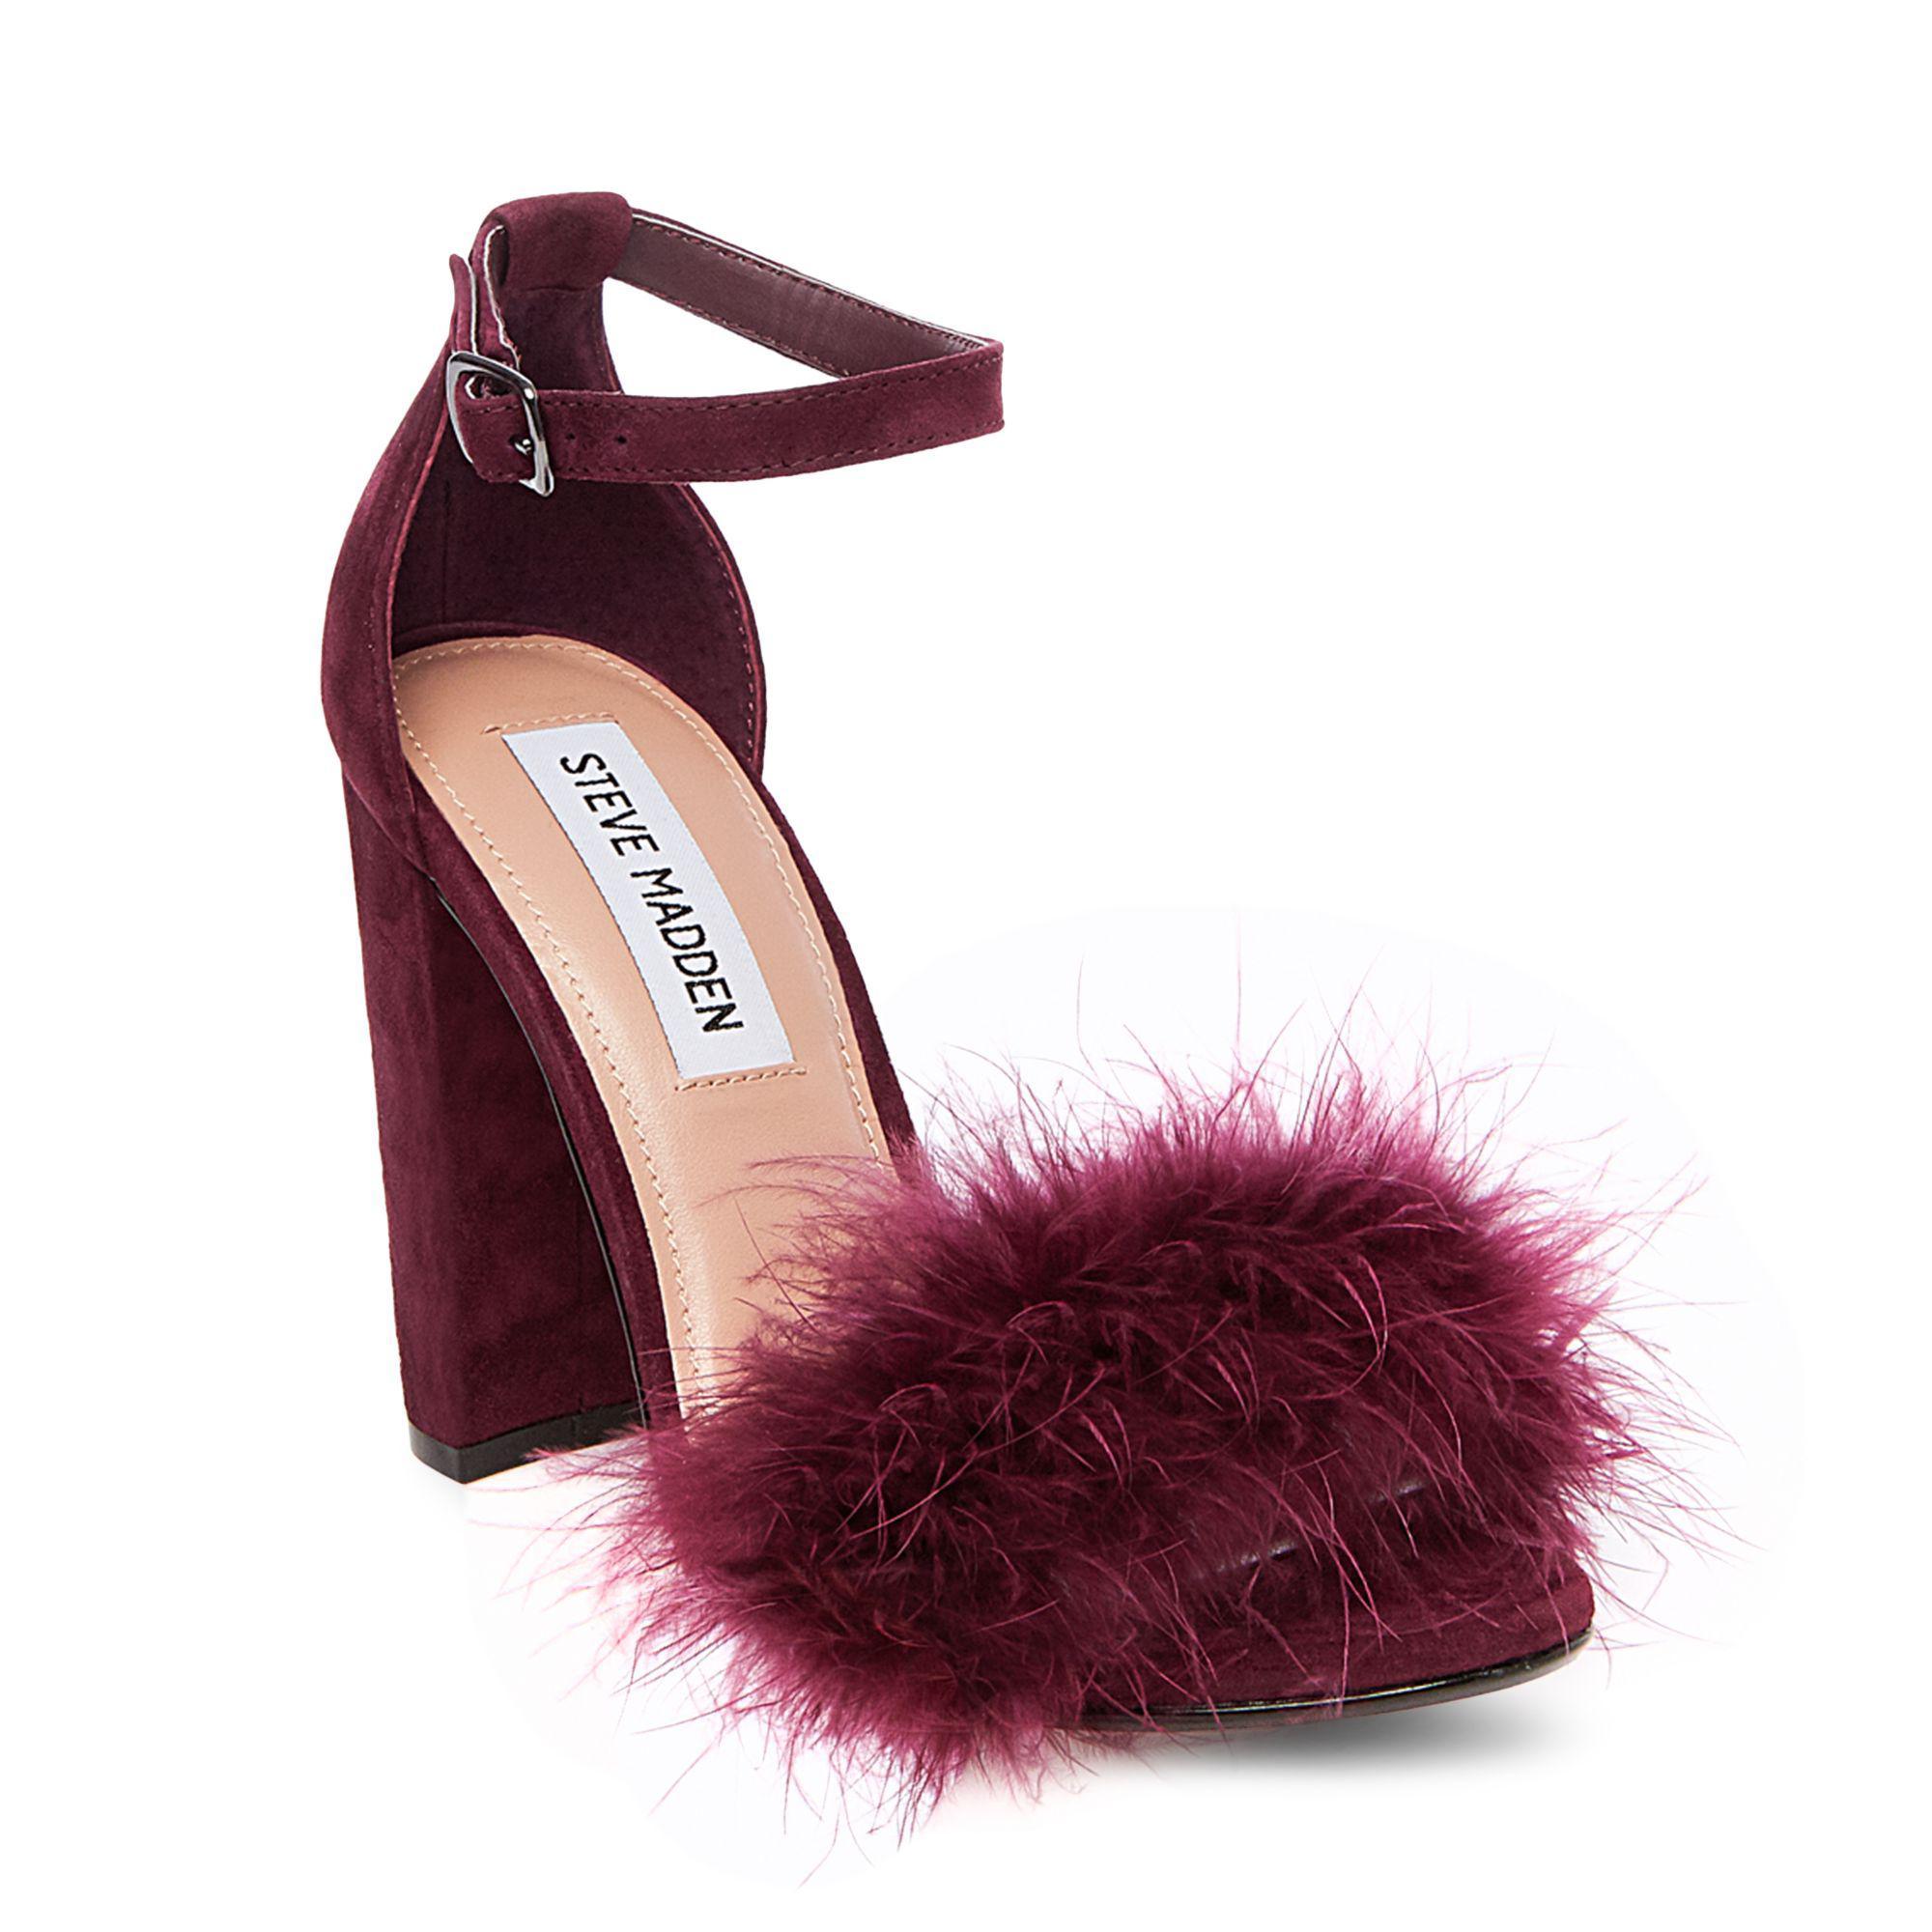 7ecef9e6f57 Lyst - Steve Madden Carabu Feather Suede Block Heel Dress Sandals in ...